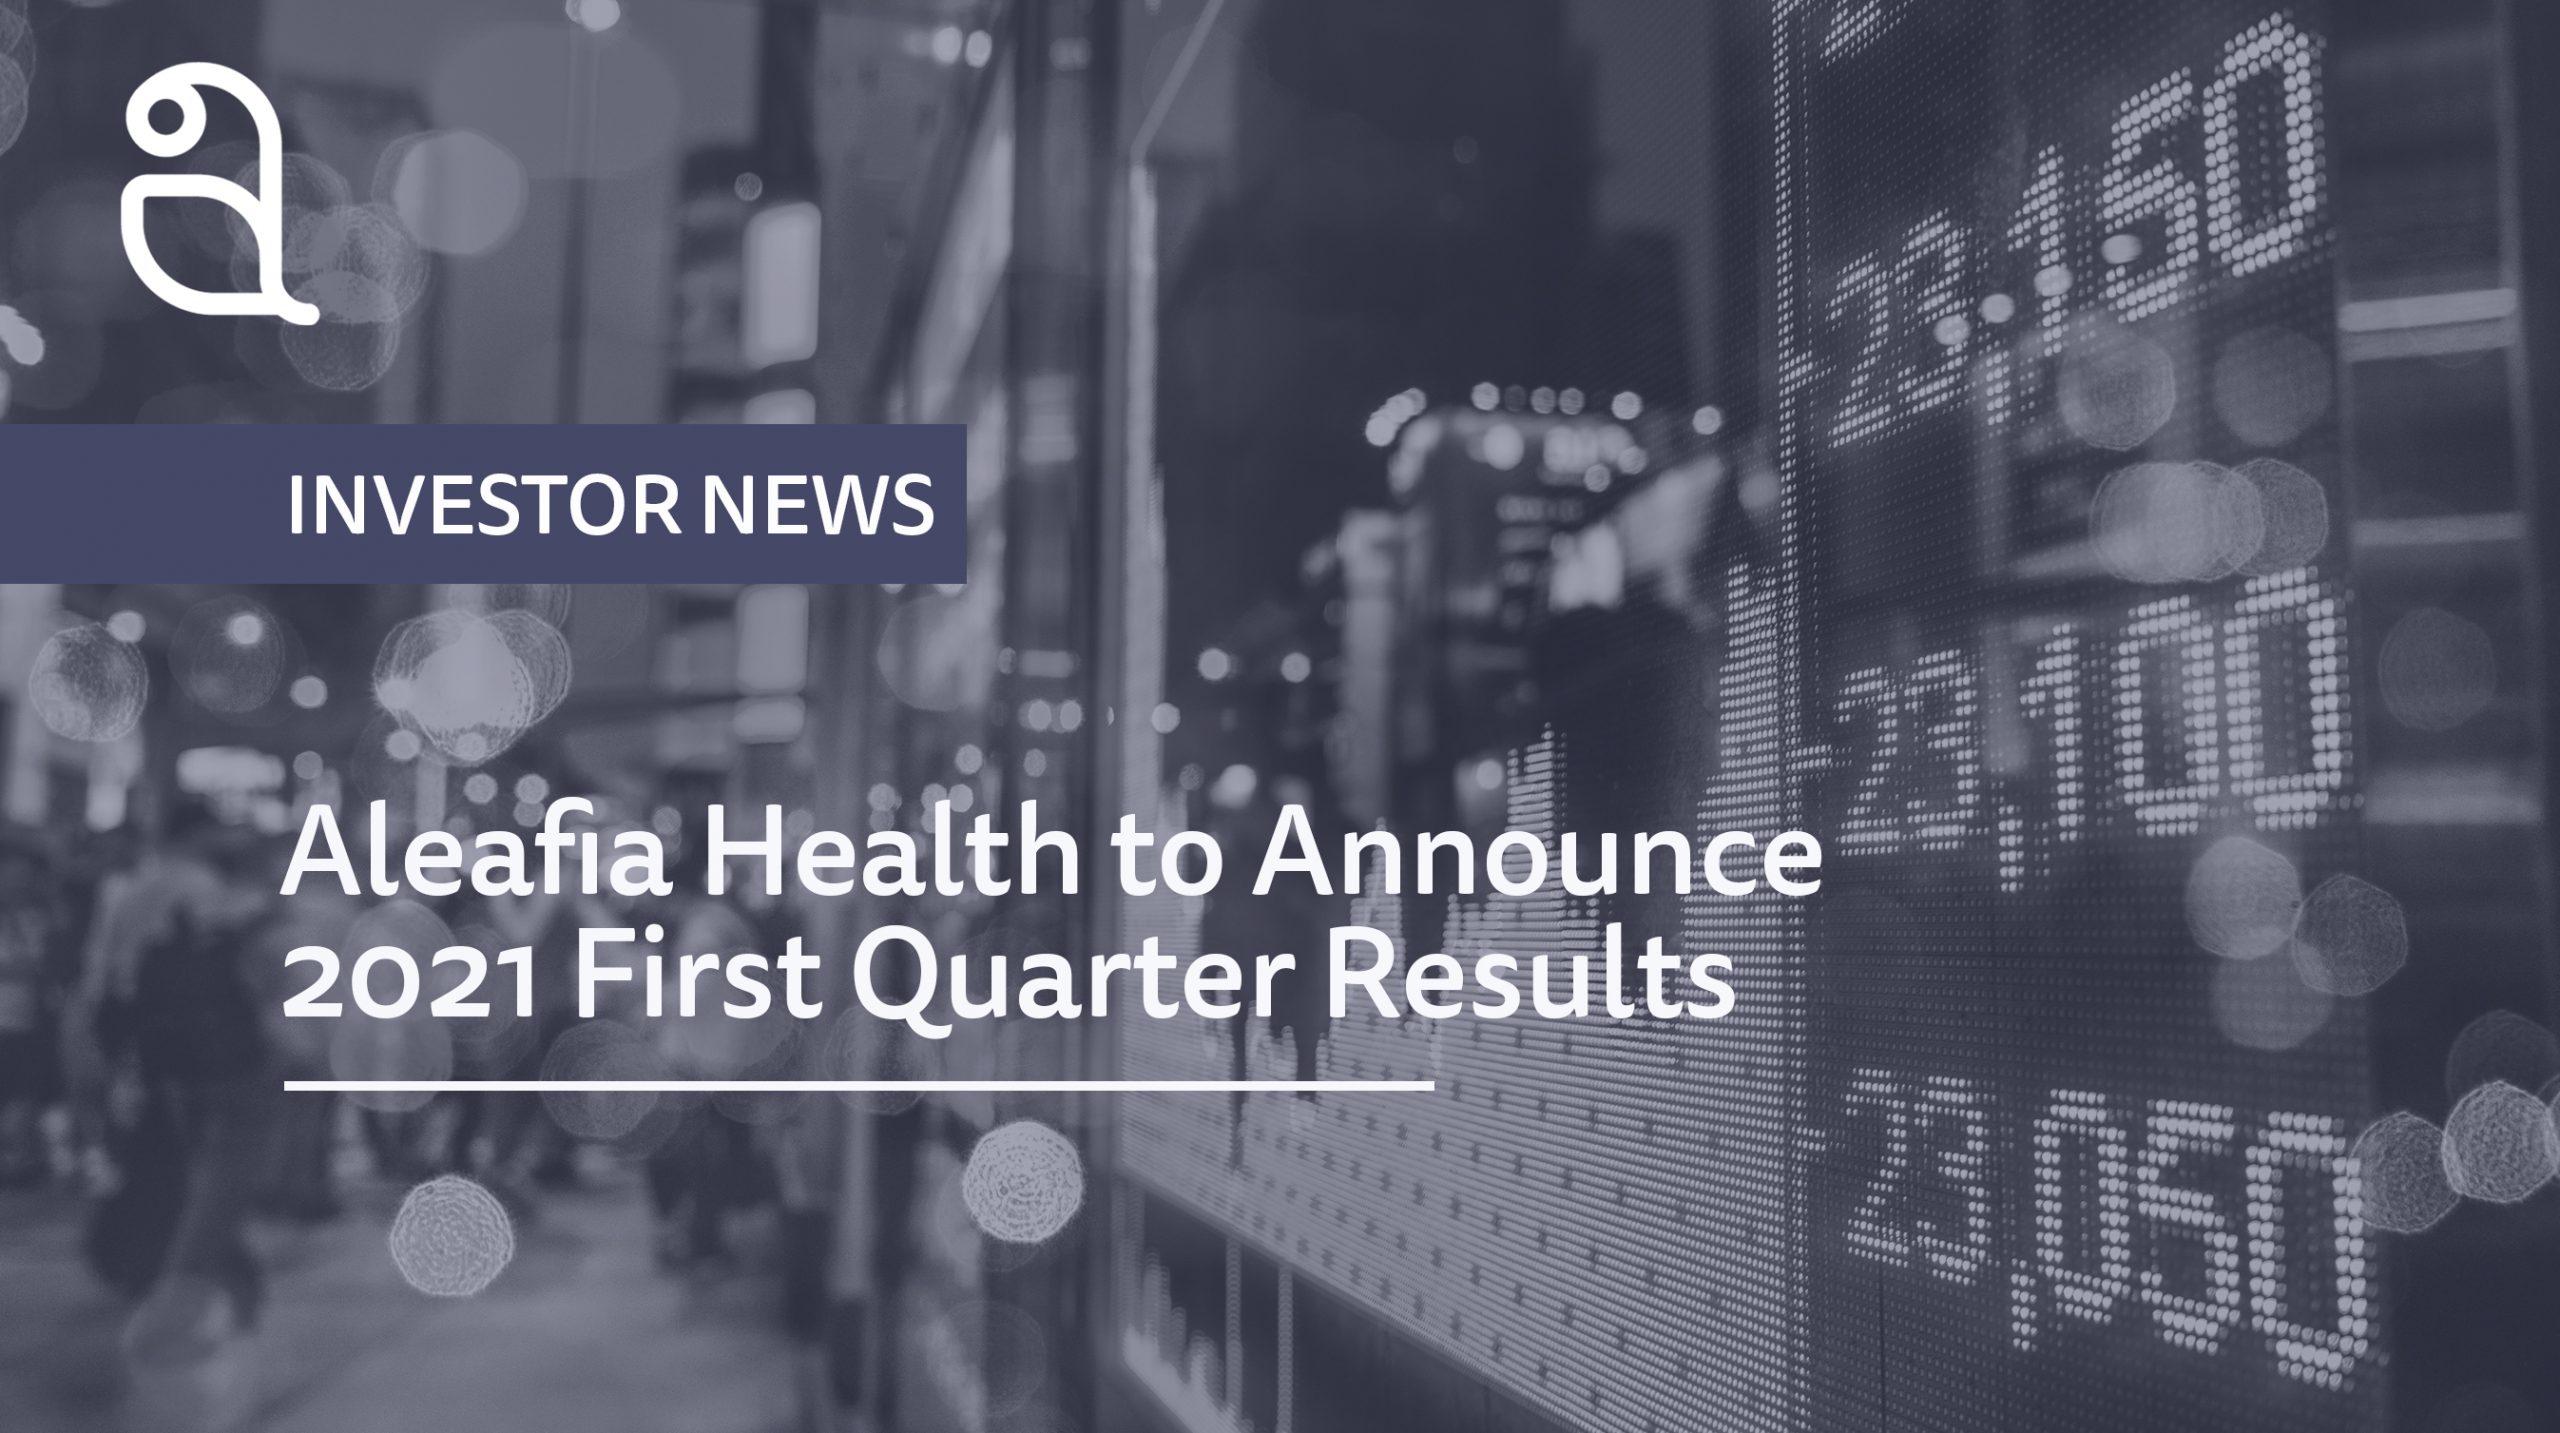 Aleafia Health to Announce 2021 First Quarter Results